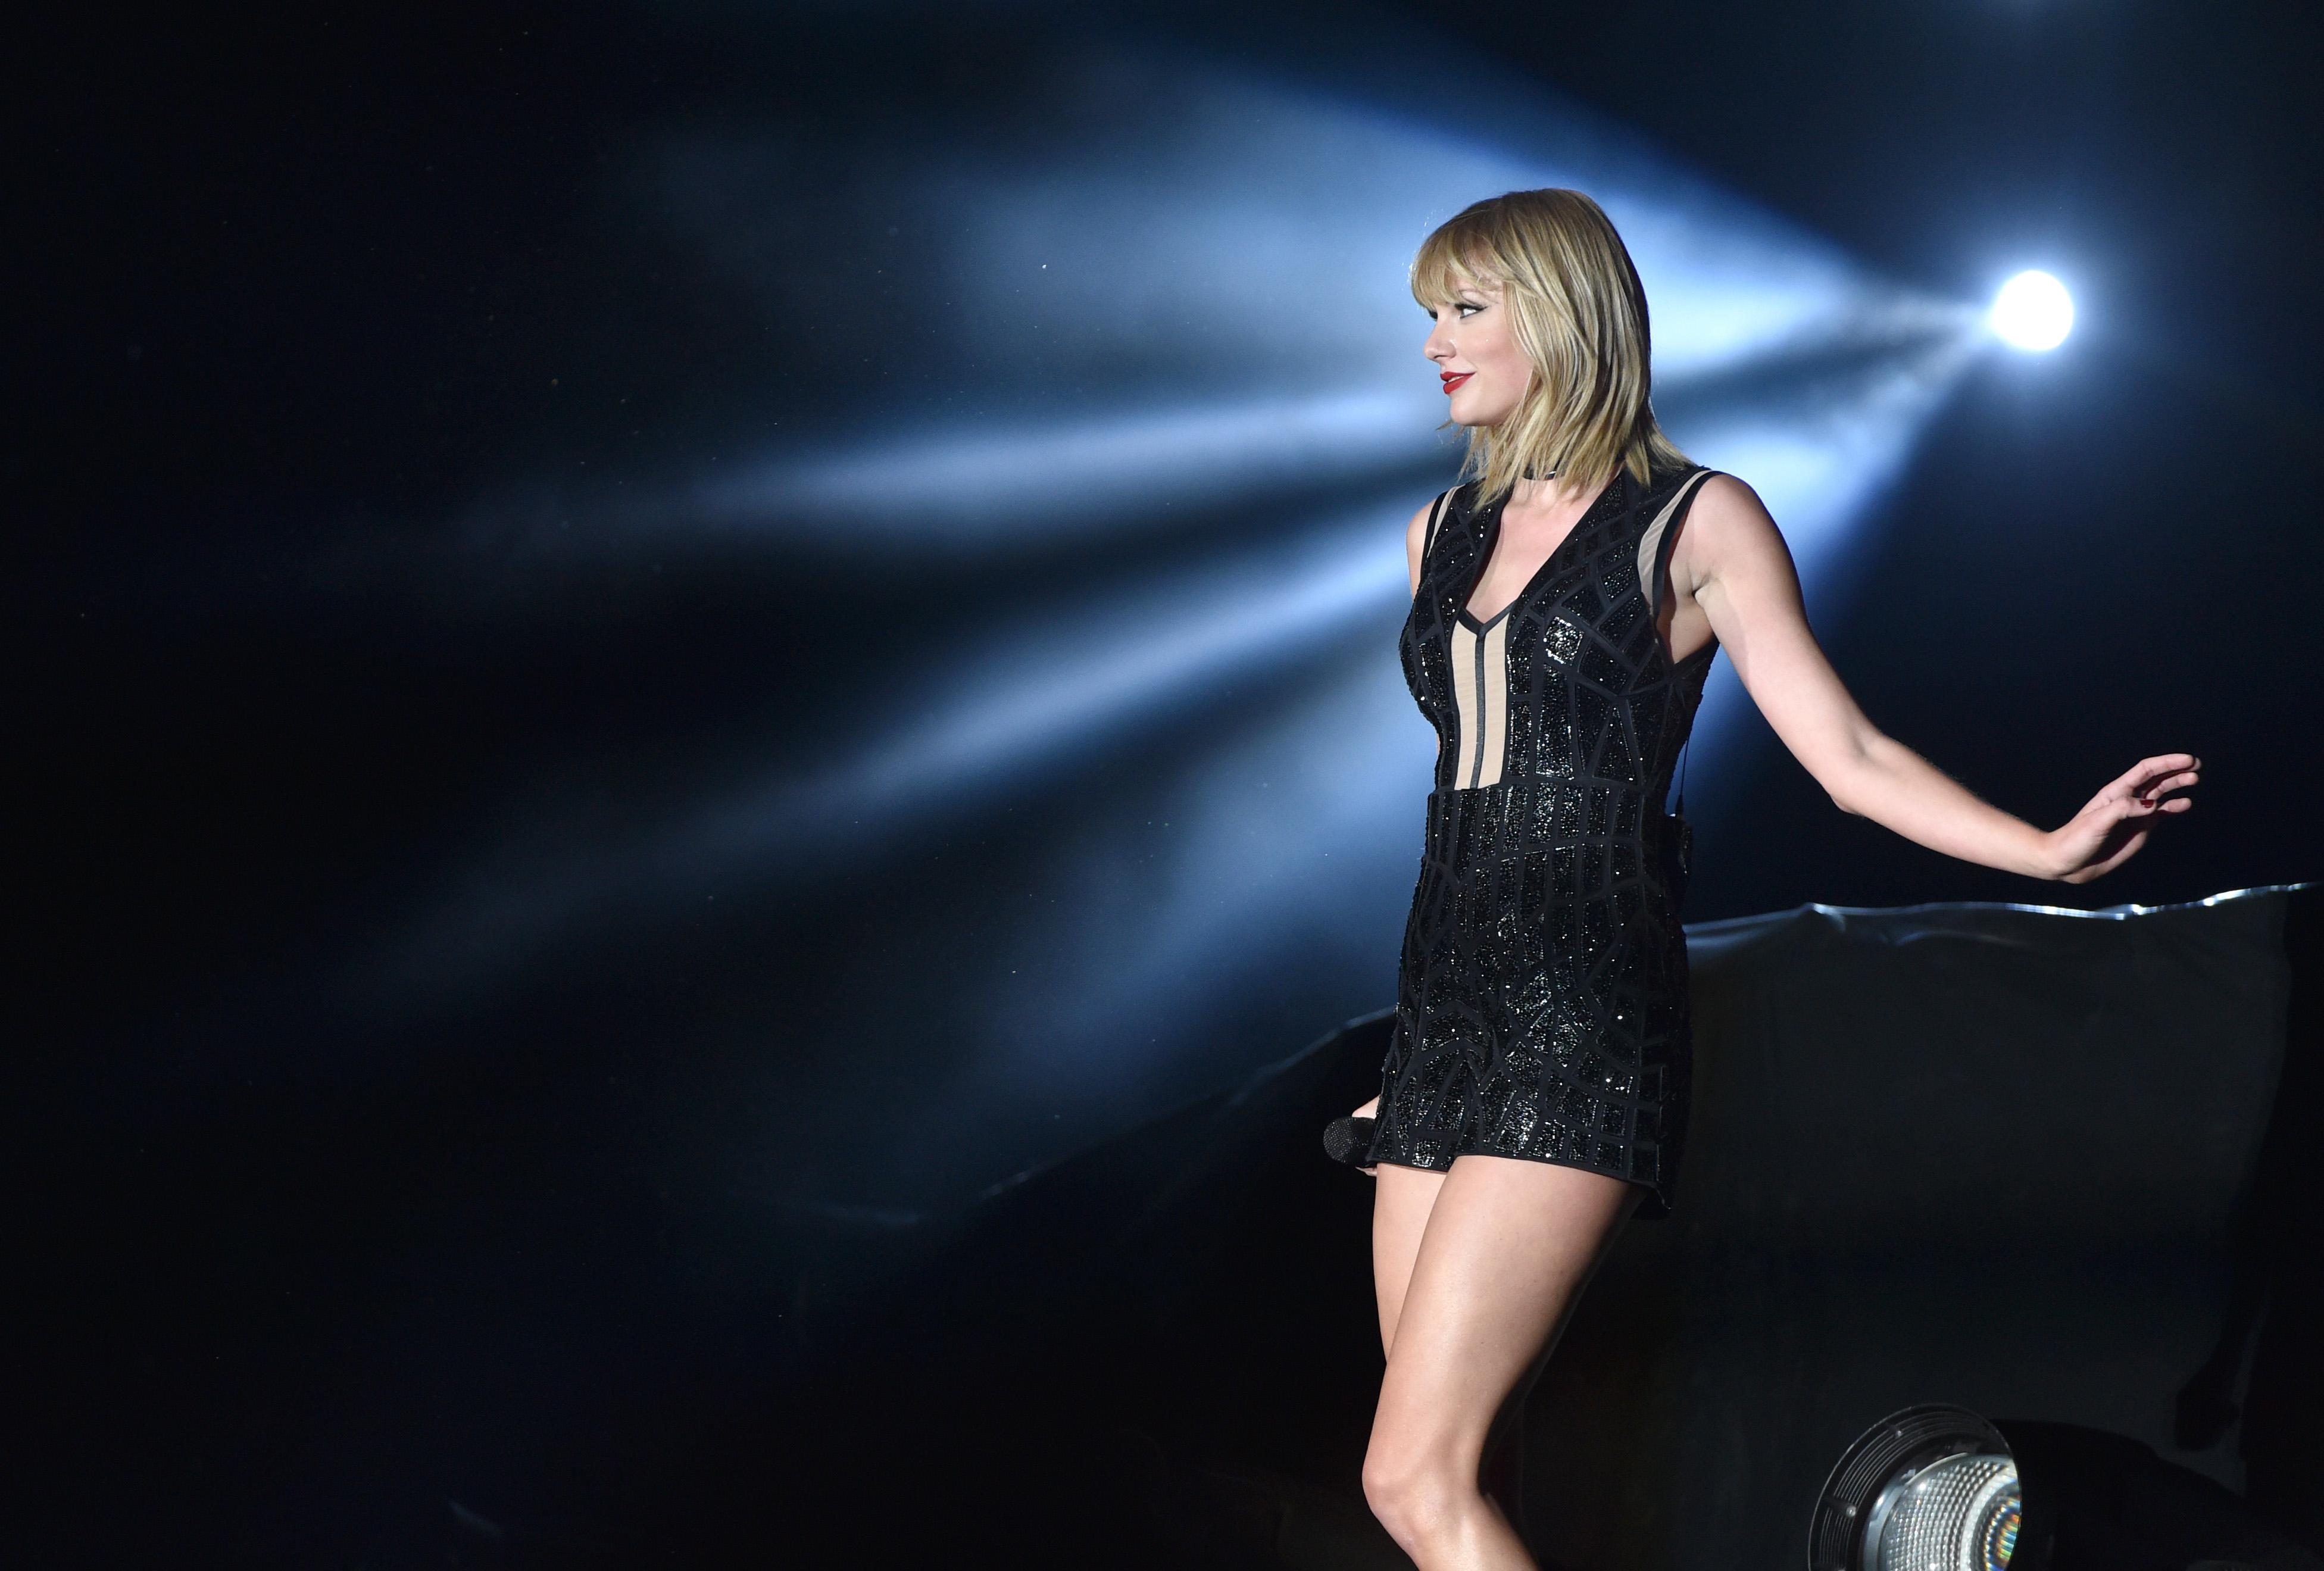 Top celebs of the day (17 photos)